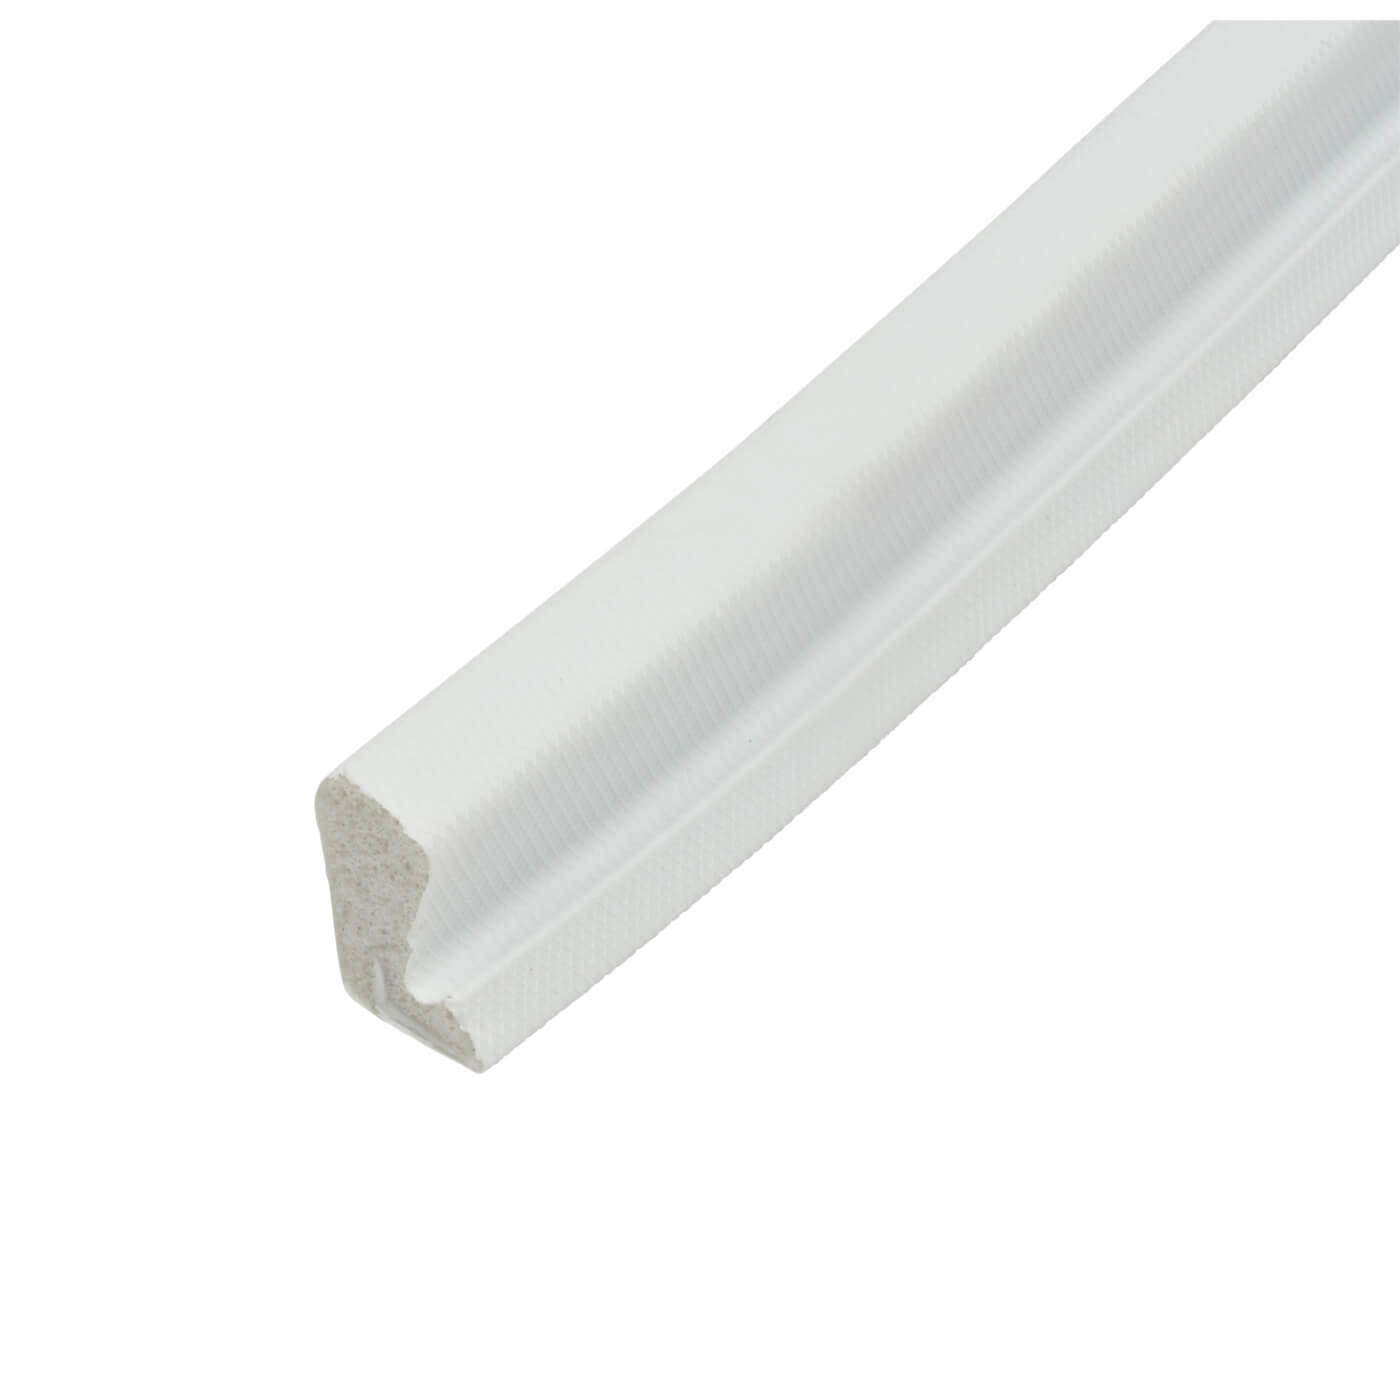 Schlegel AQ109 (QL3011) AquaMac Seal - 10 metres - White)